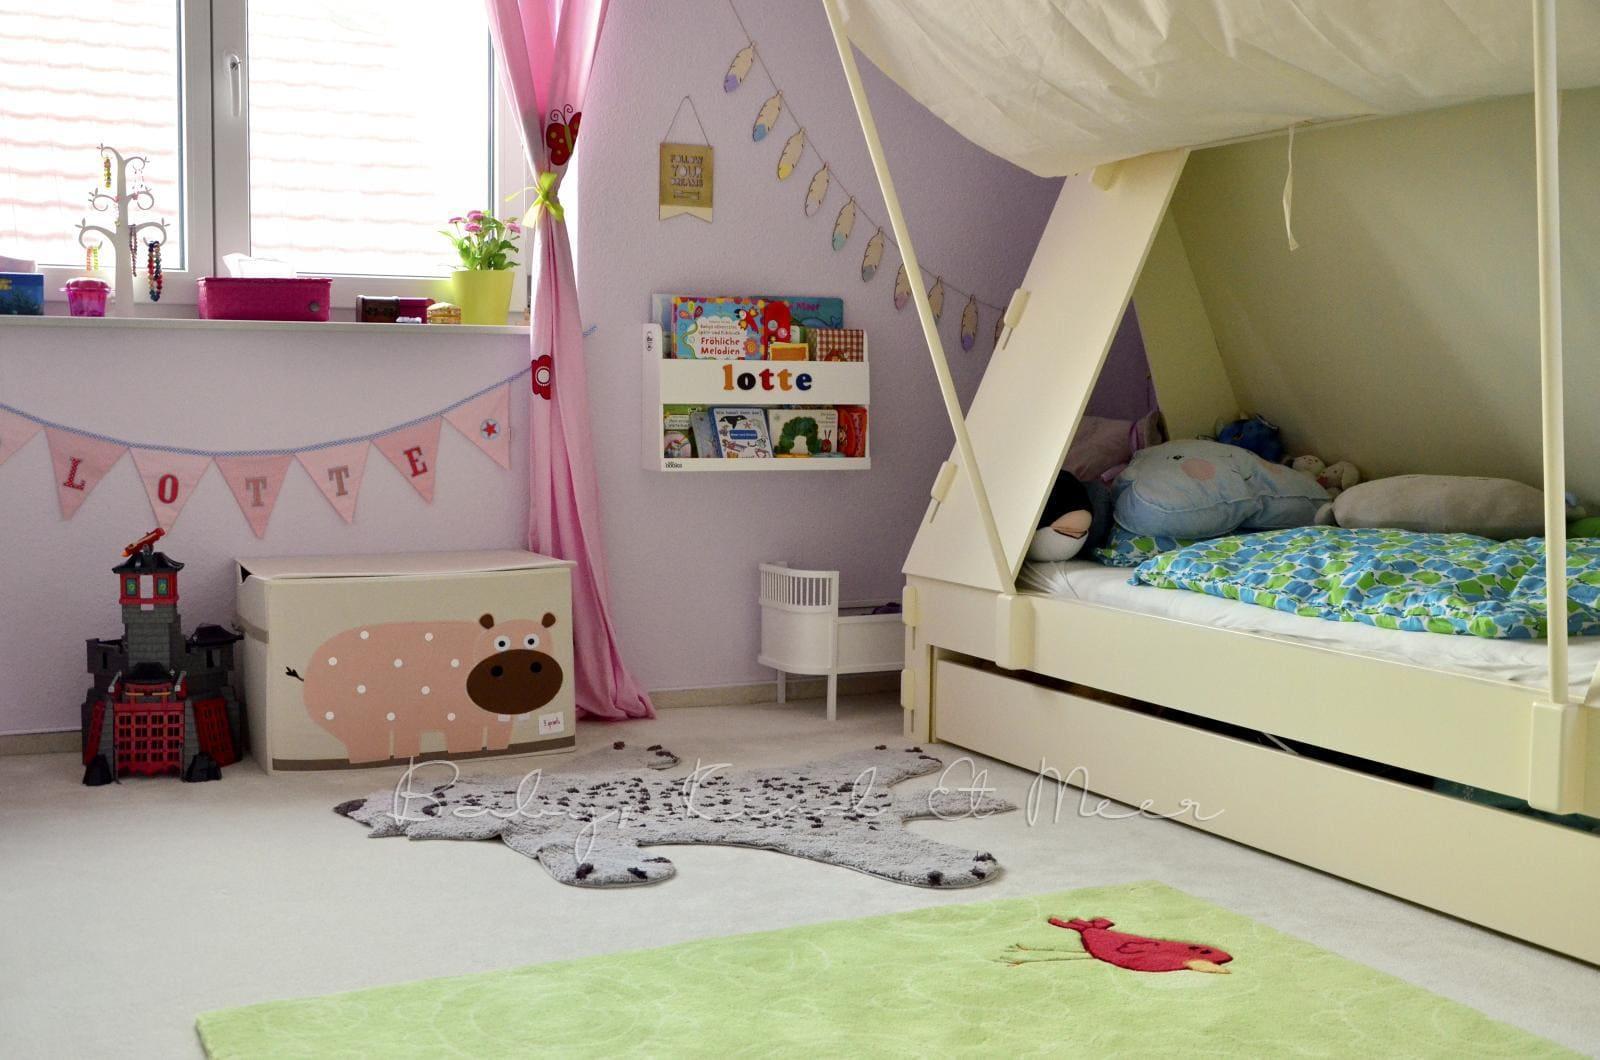 kinderzimmer baby junge kreative bilder f r zu hause. Black Bedroom Furniture Sets. Home Design Ideas